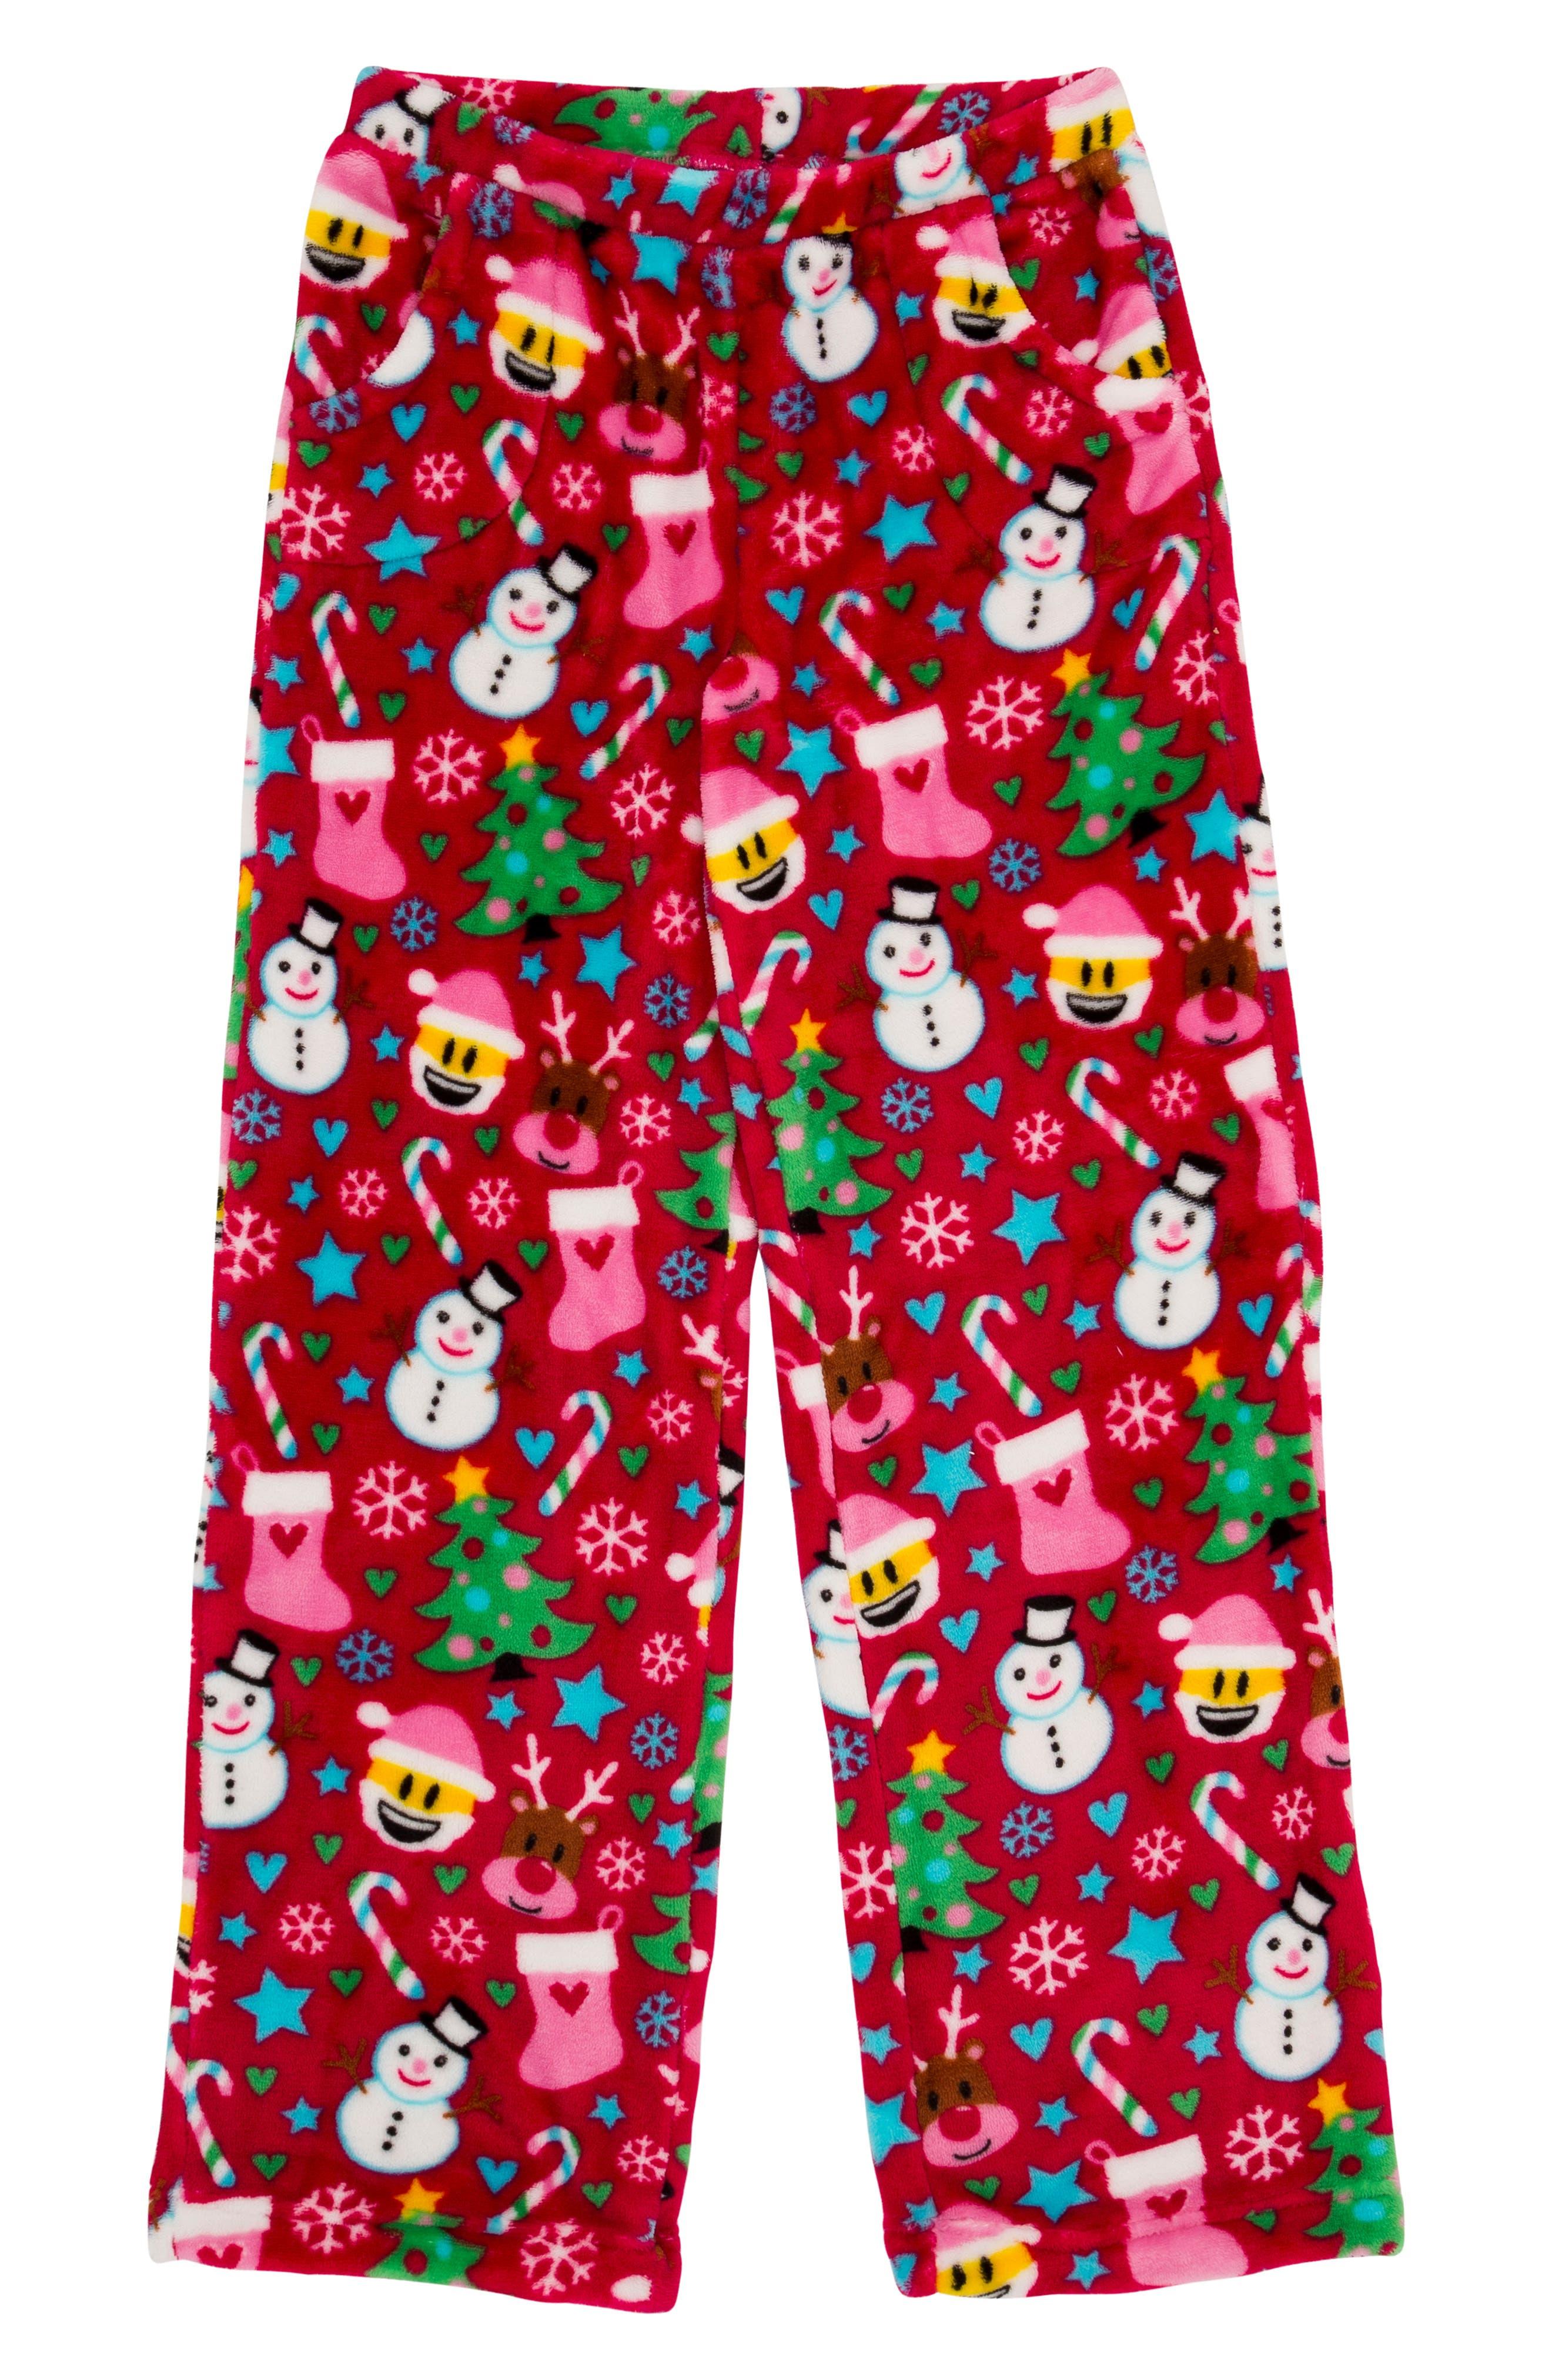 Girls Candy Pink Holiday Fleece Pajama Pants